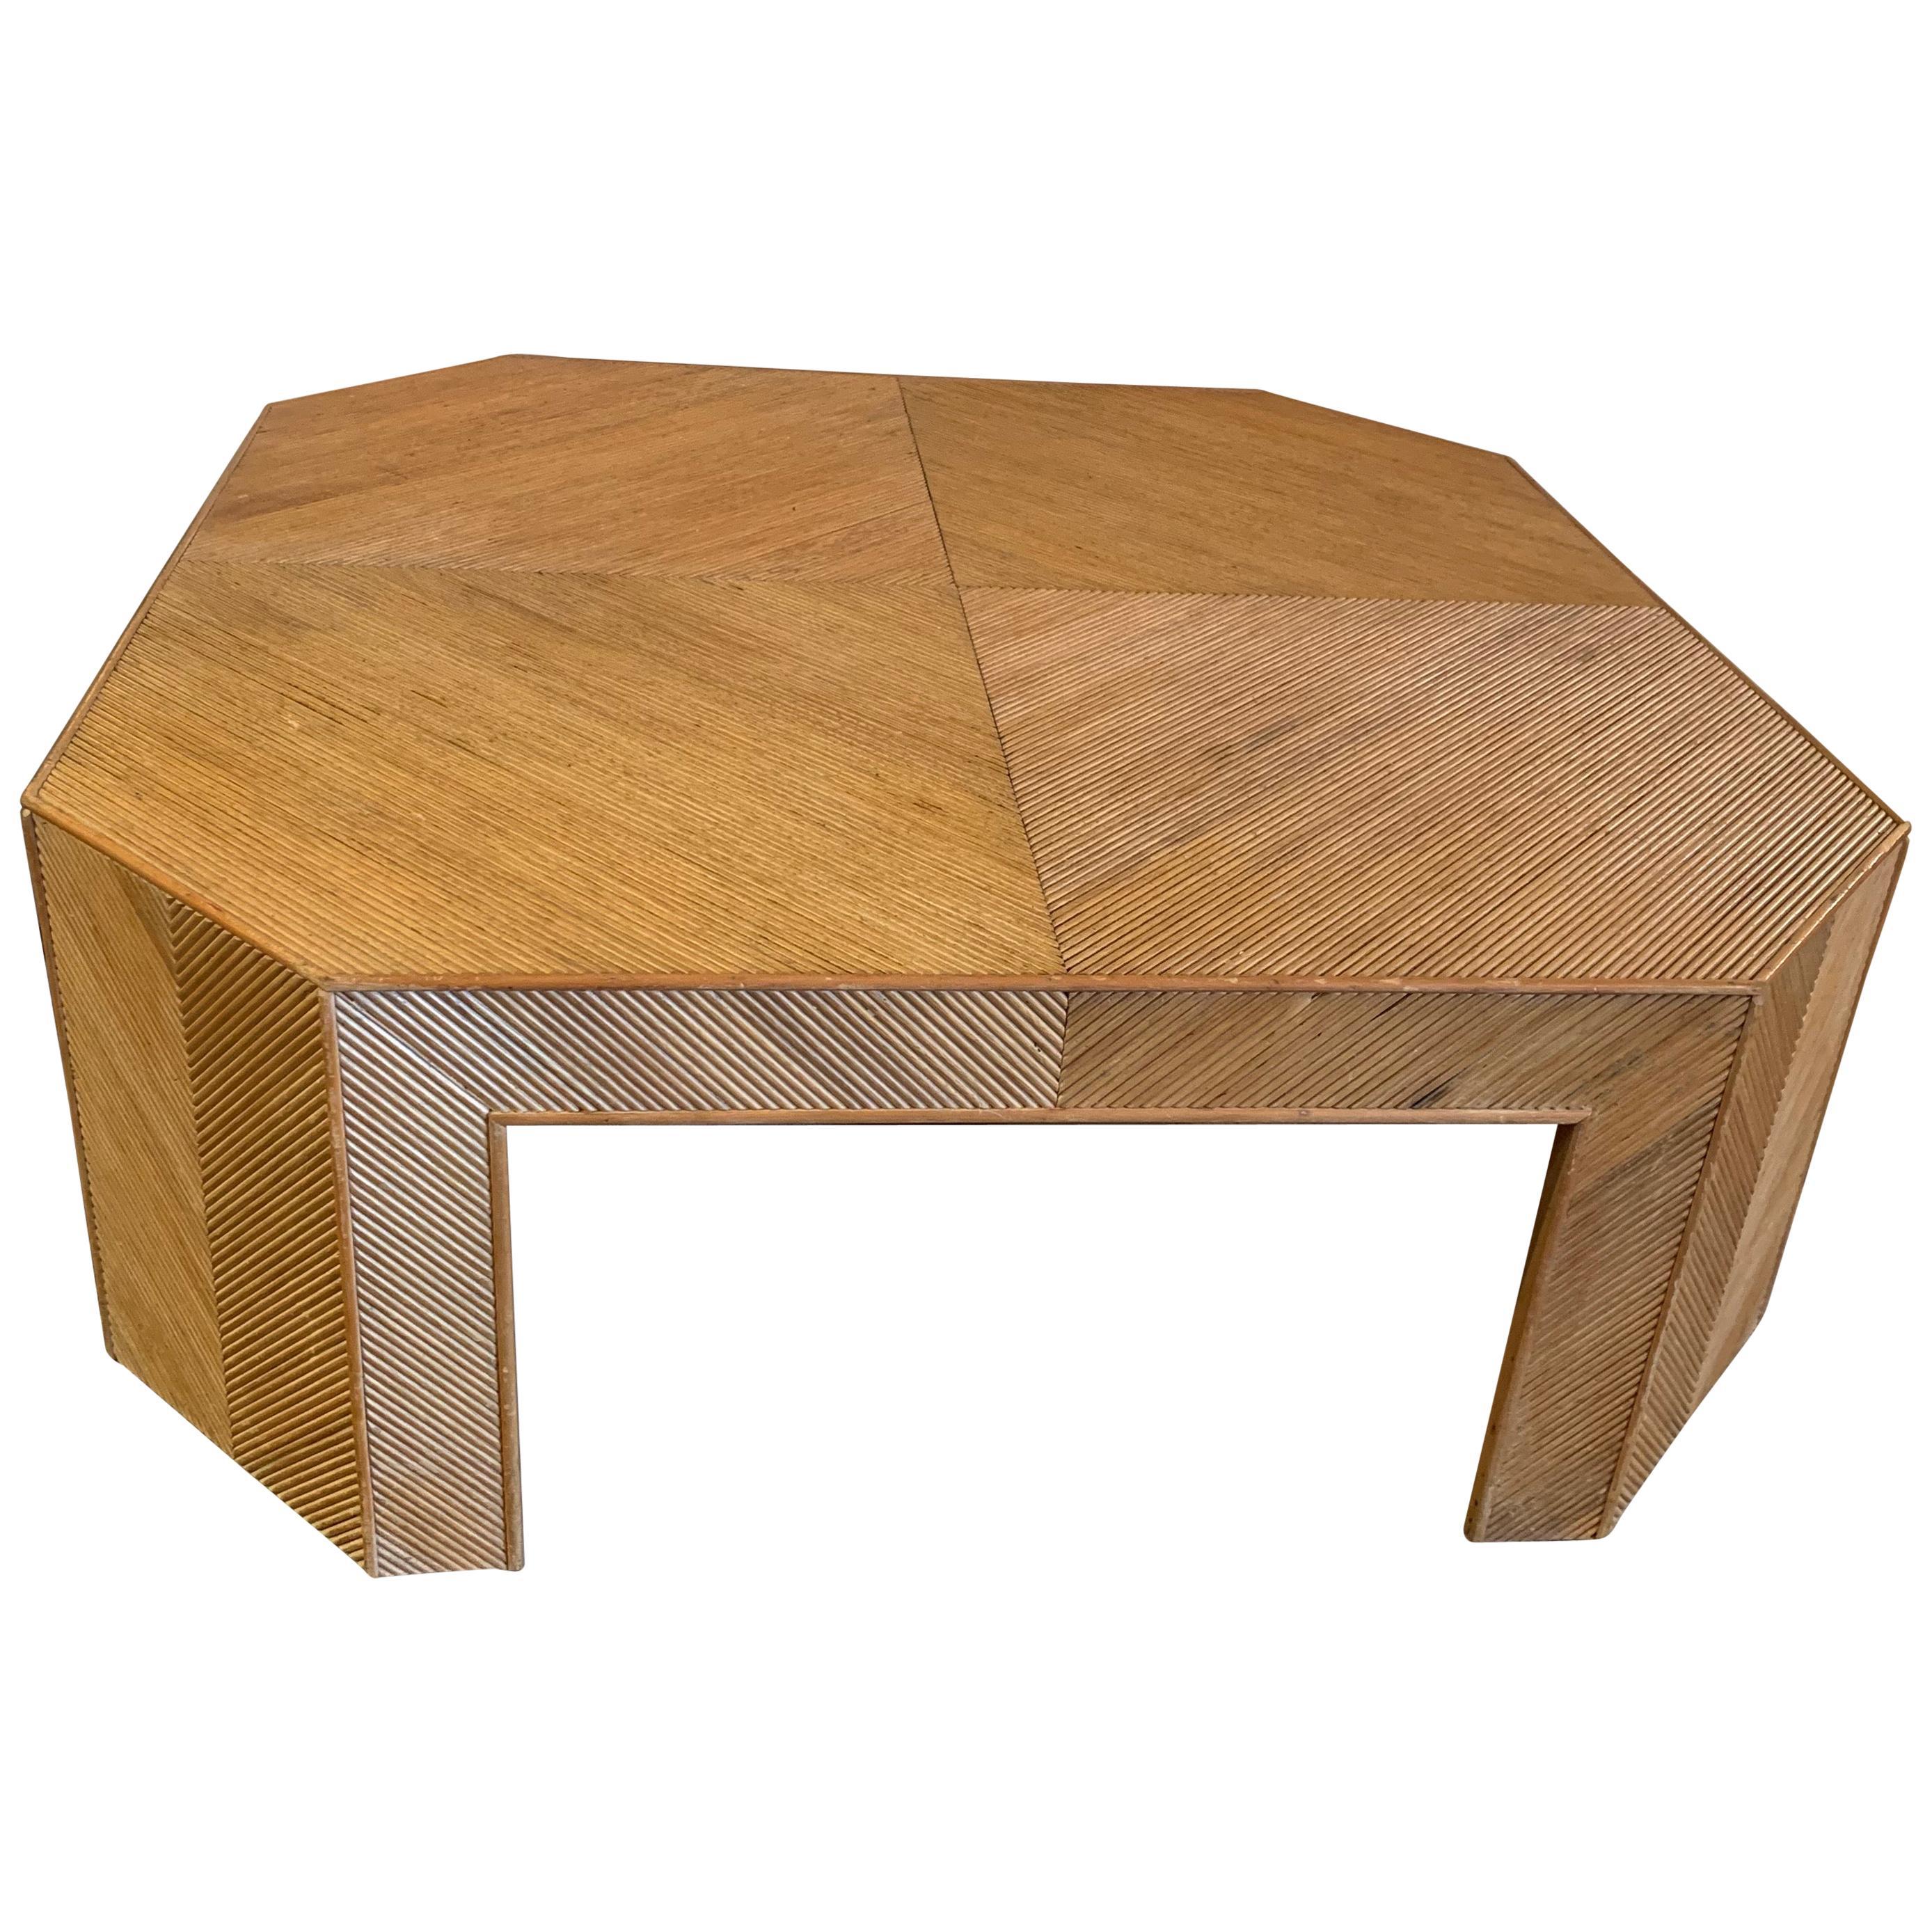 Very Large Mid Century Modern Geometric Bamboo Rattan Coffee Table